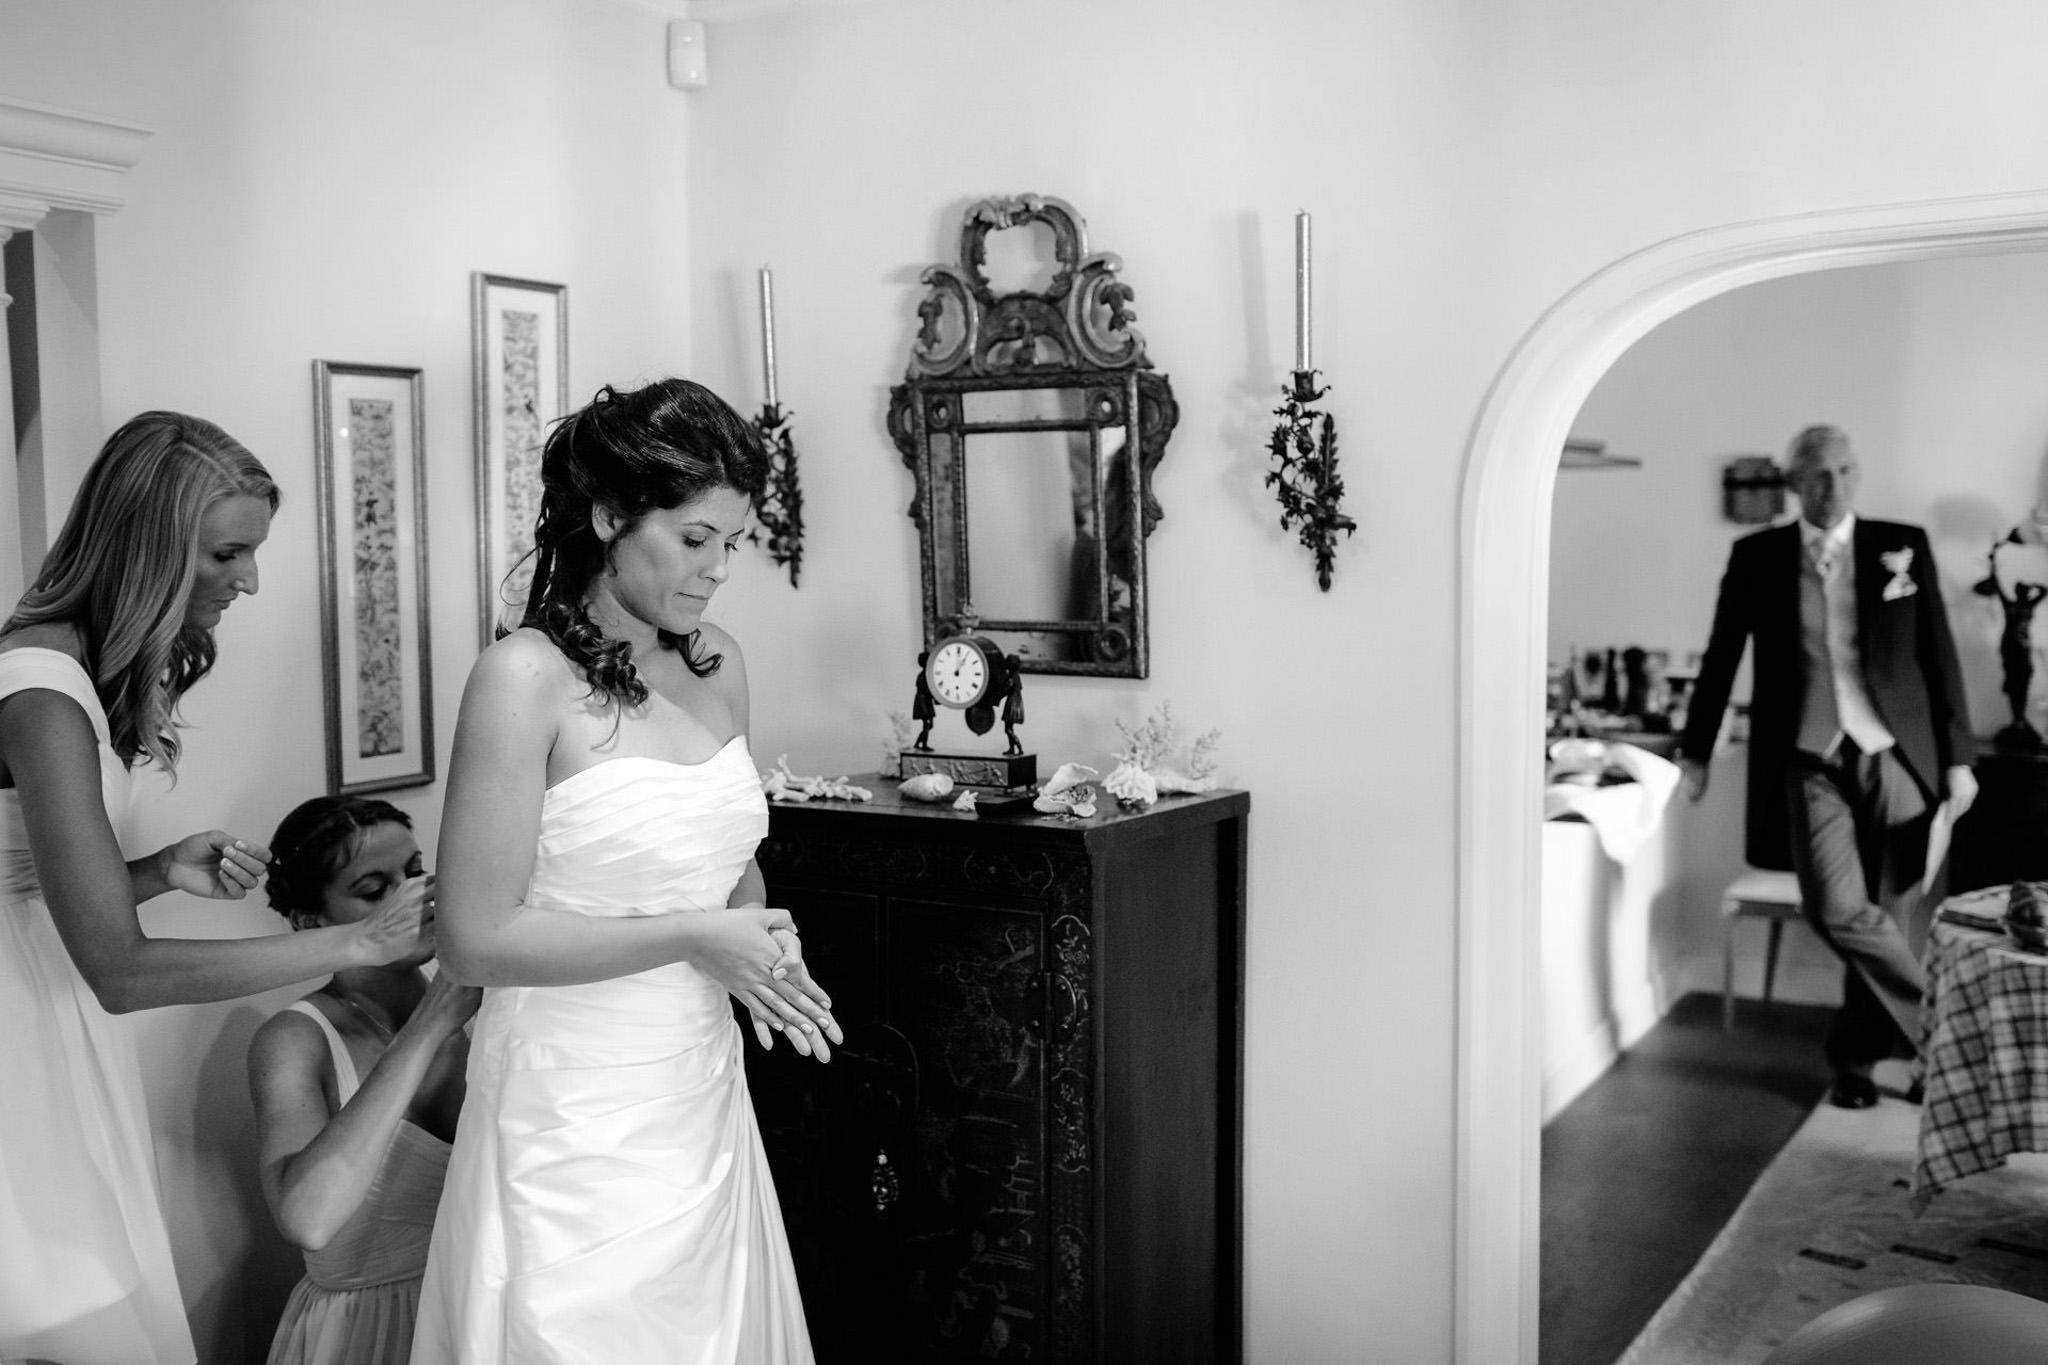 St. Pancras Renaissance hotel wedding bride in the dress